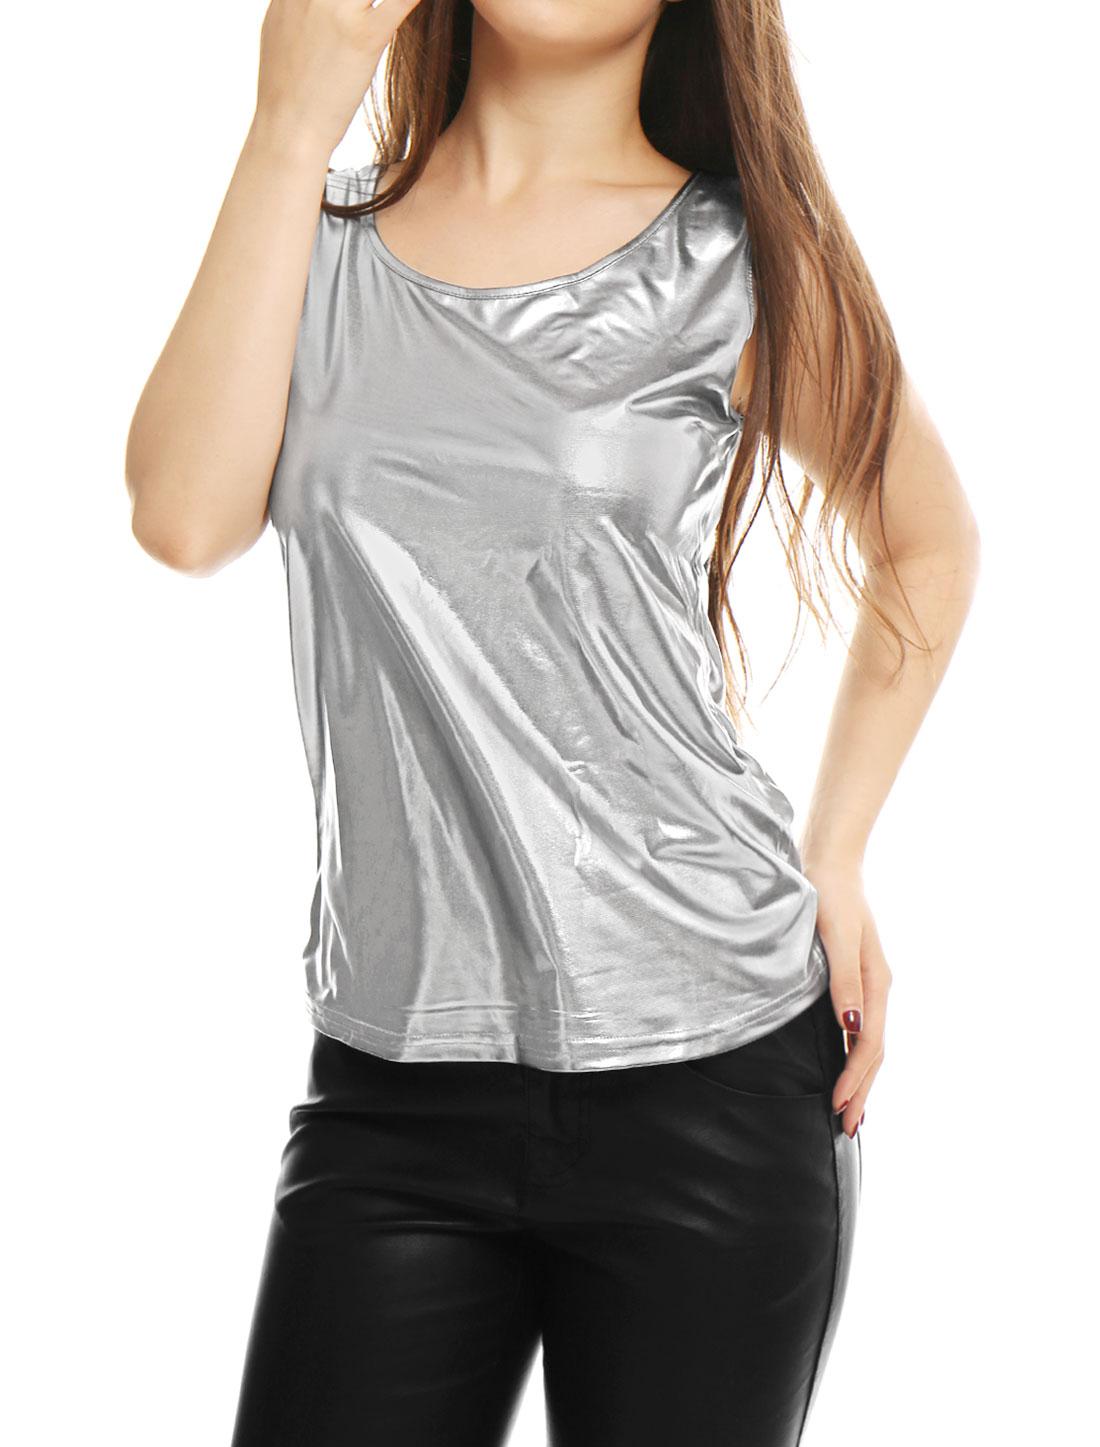 Women Stretchy U Neck Slim Fit Metallic Sleeveless Top Silver XL